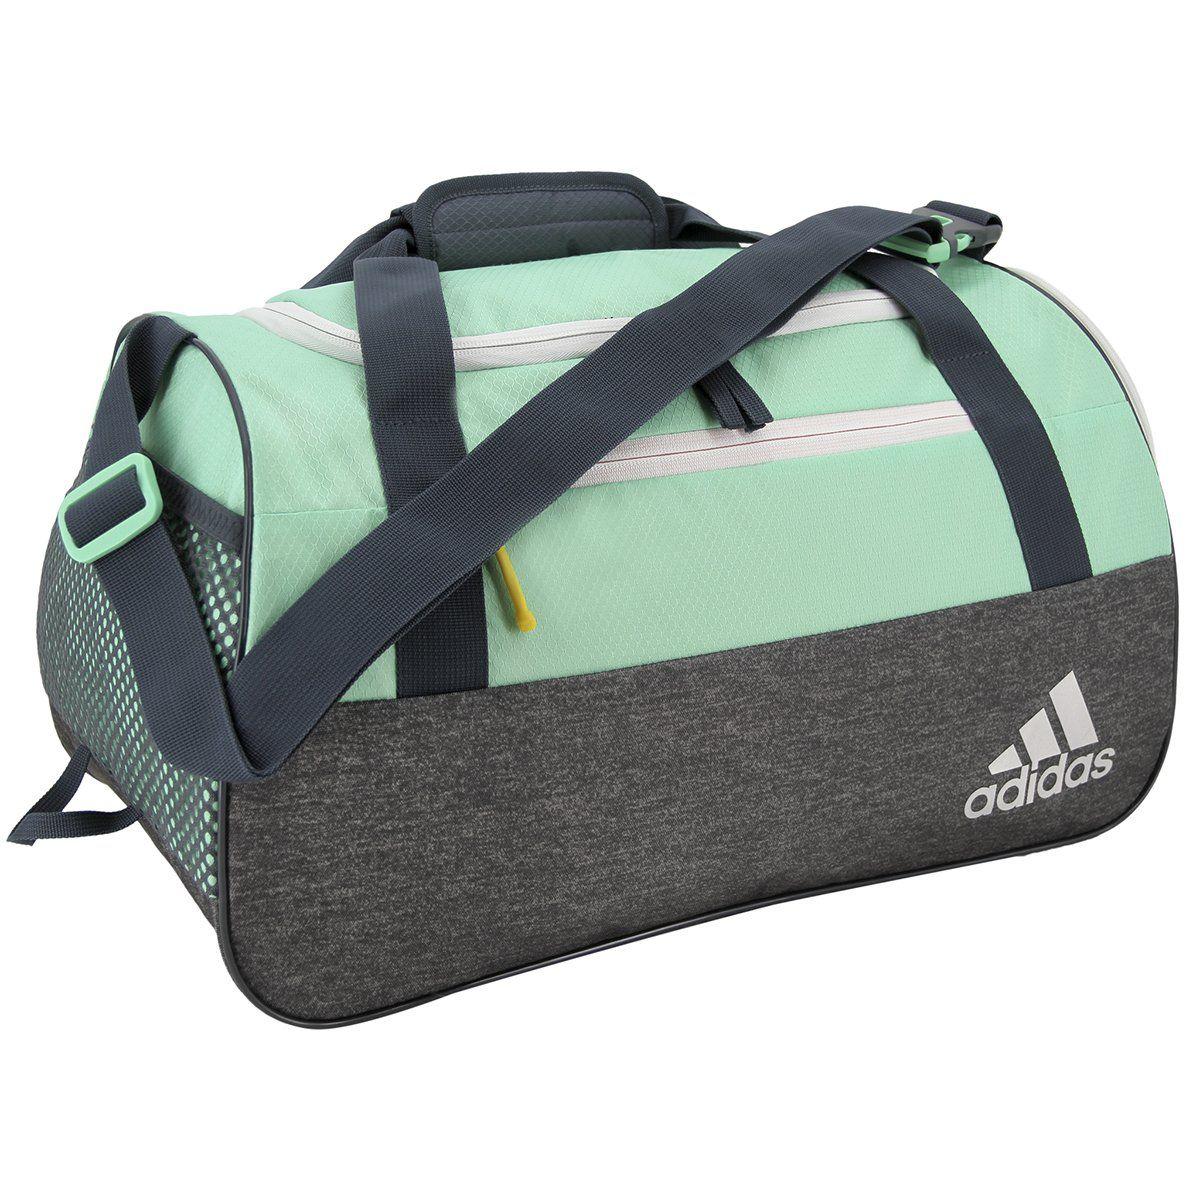 Amazon.com: Adidas Squad III Duffel Bag, Deepest Space ...